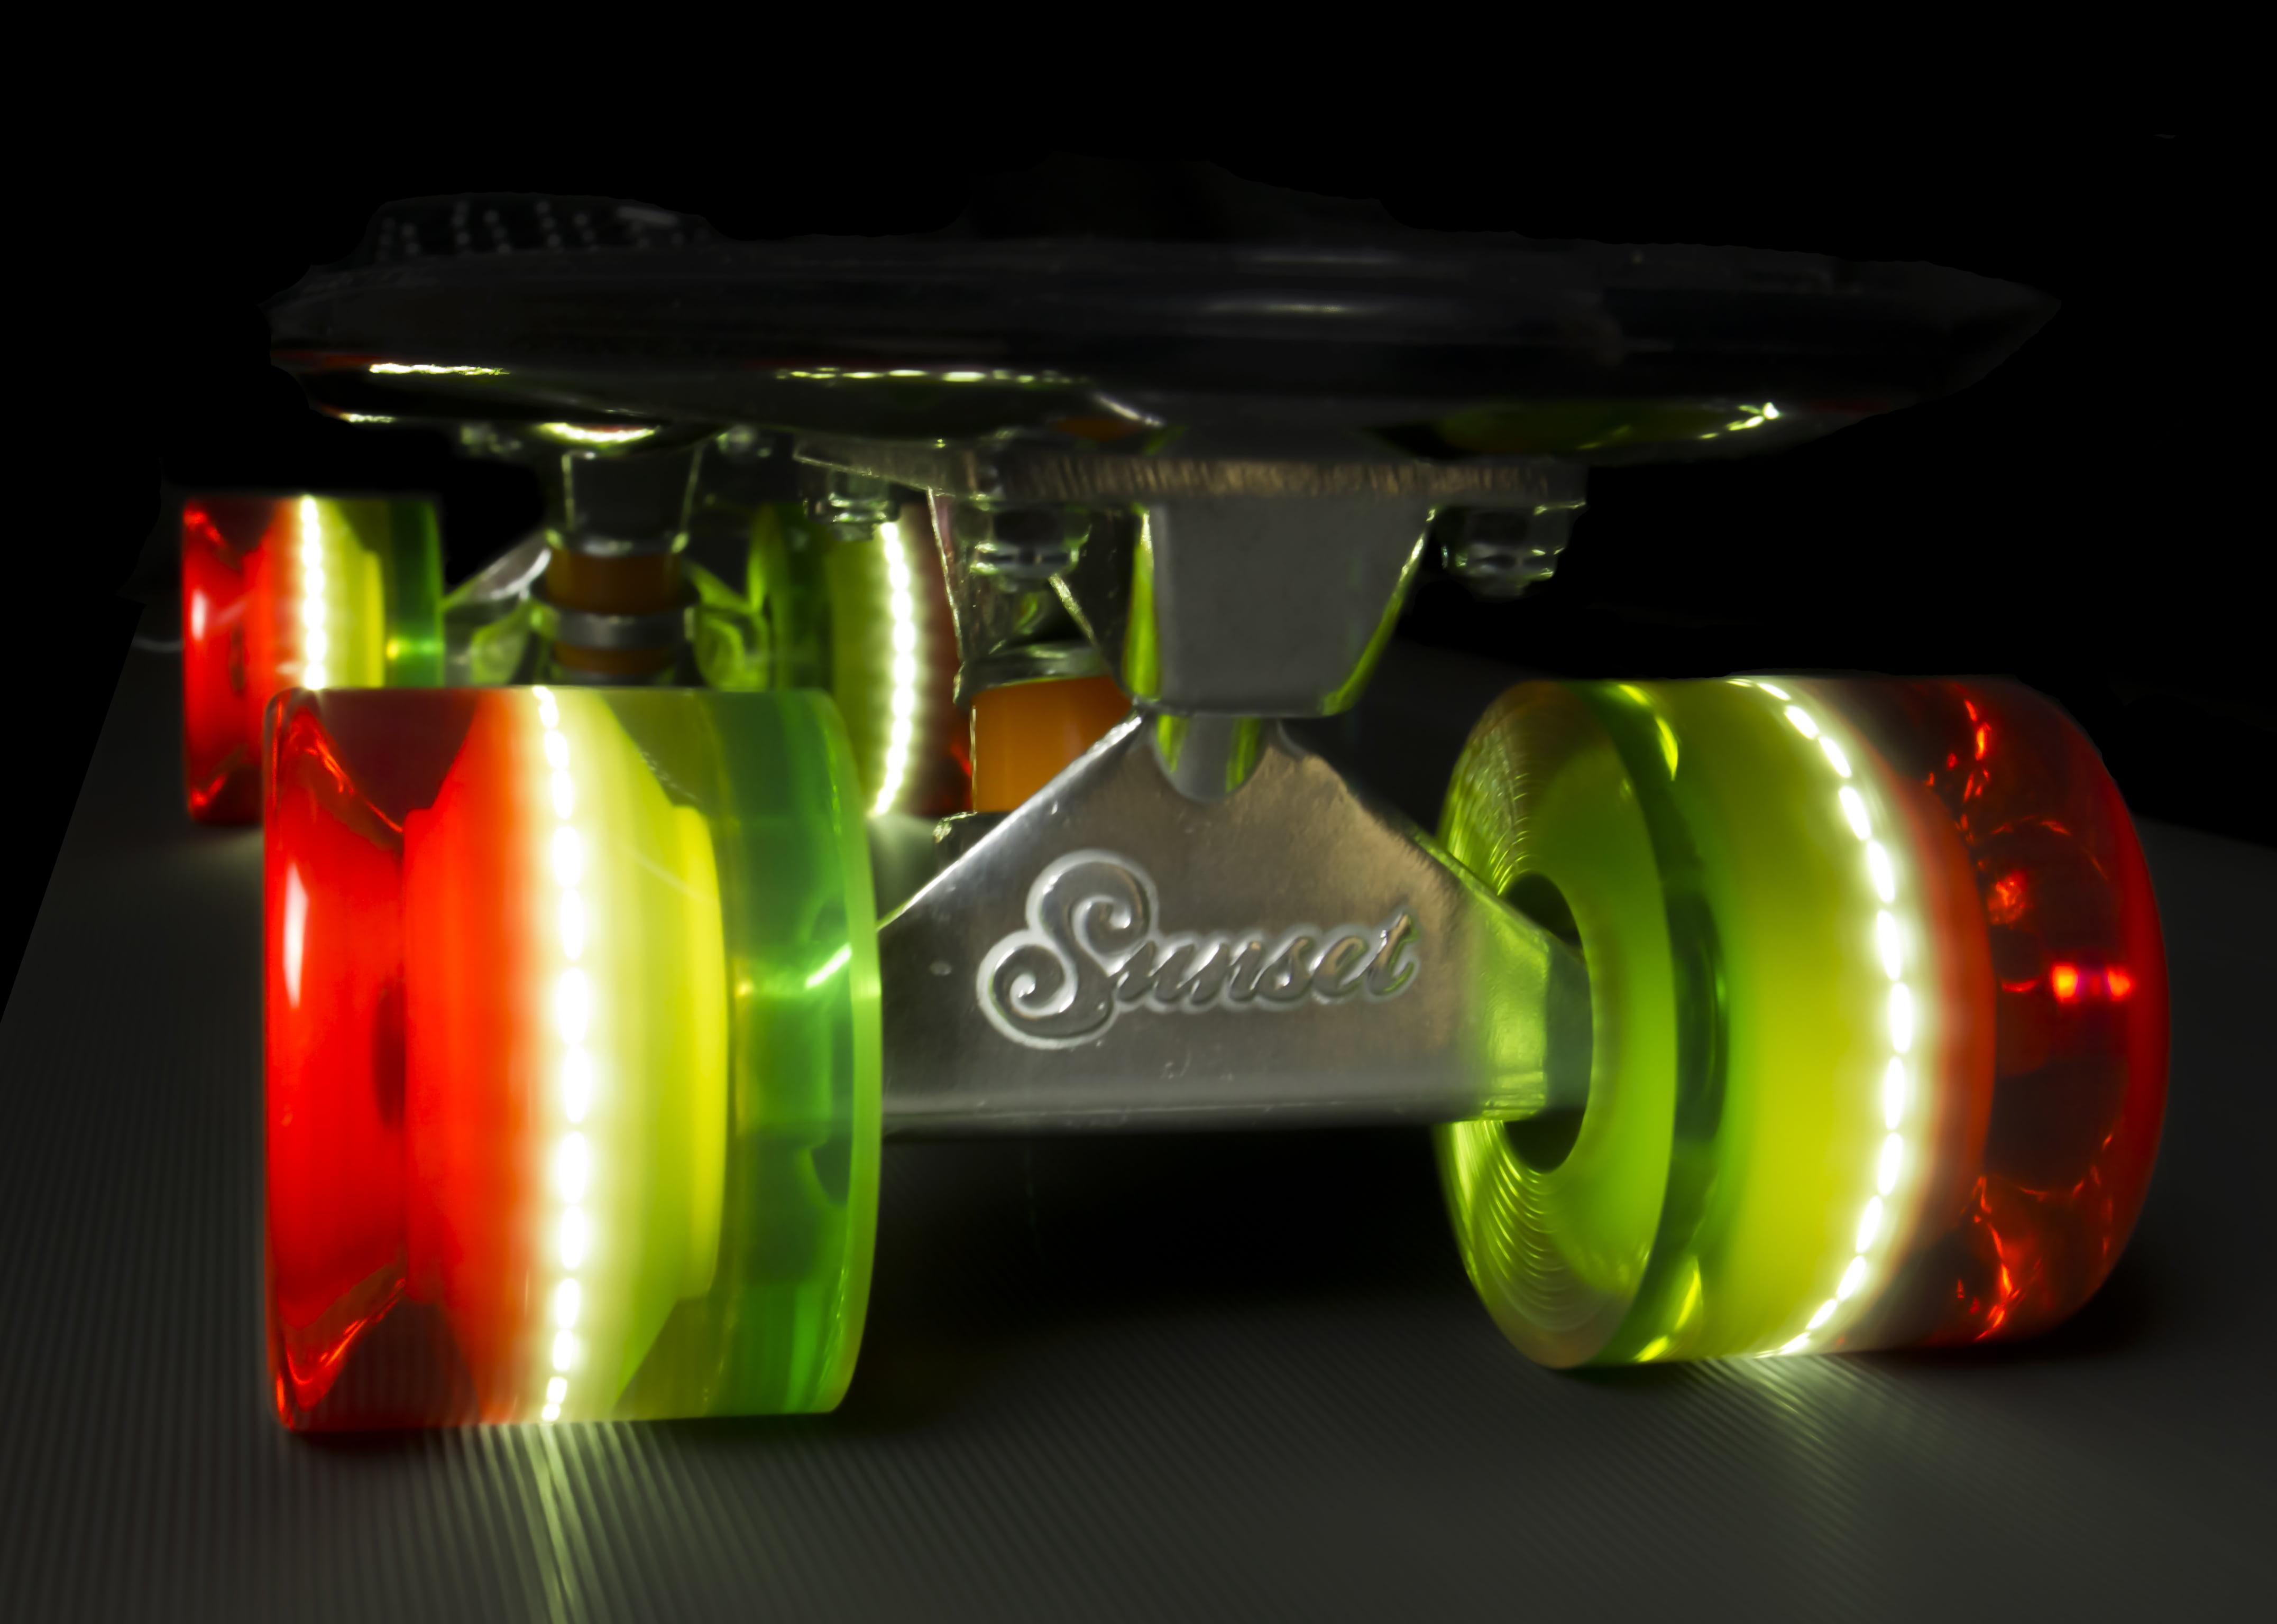 SUNSET SKATEBOARDS Rasta 59mm Cruiser Flare Led Wheel and ABEC-7 Bearings  (4-pack) - Walmart.com 1b994a895ae